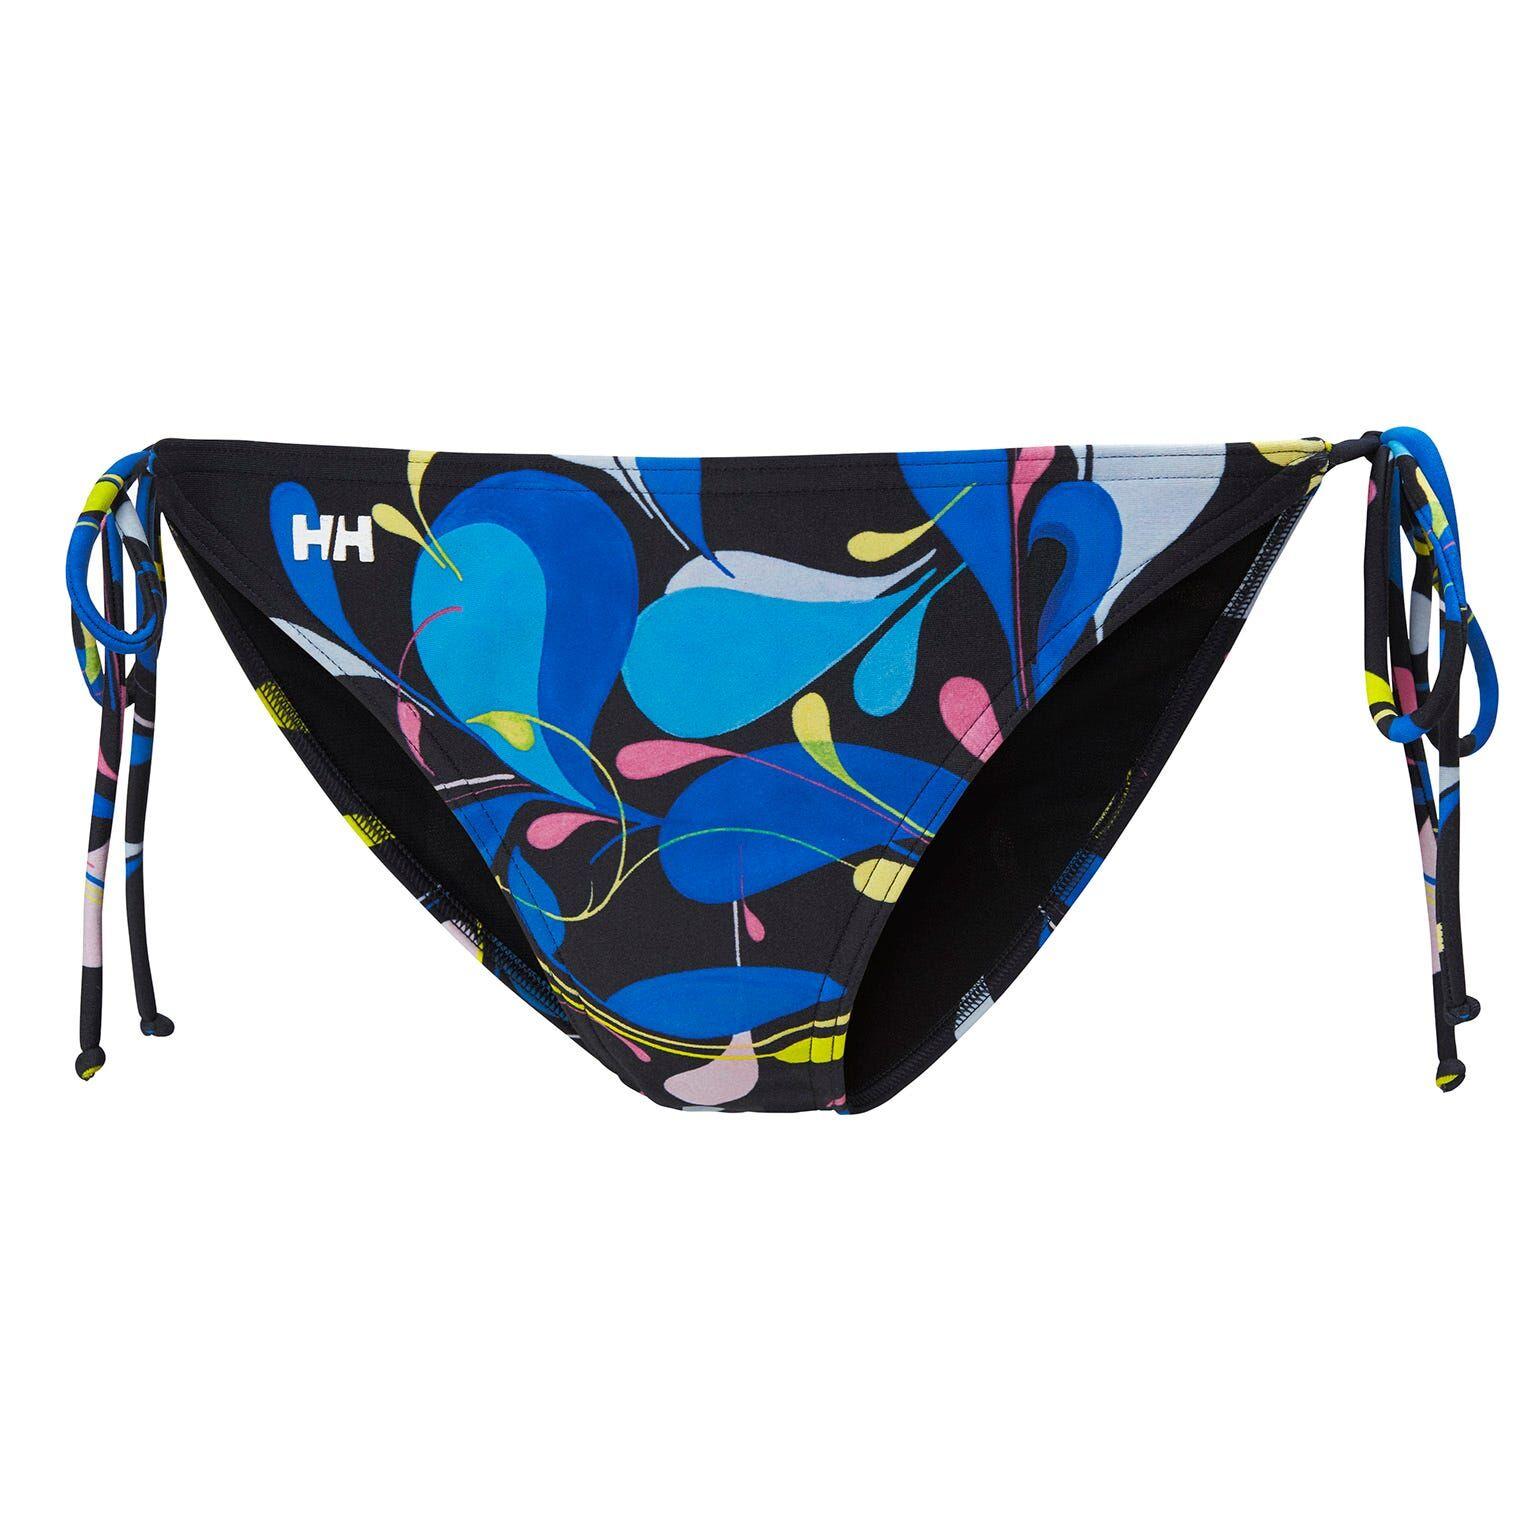 Helly Hansen Femme New Bikini Bottom Pantalon De Voile Bleu Marine M